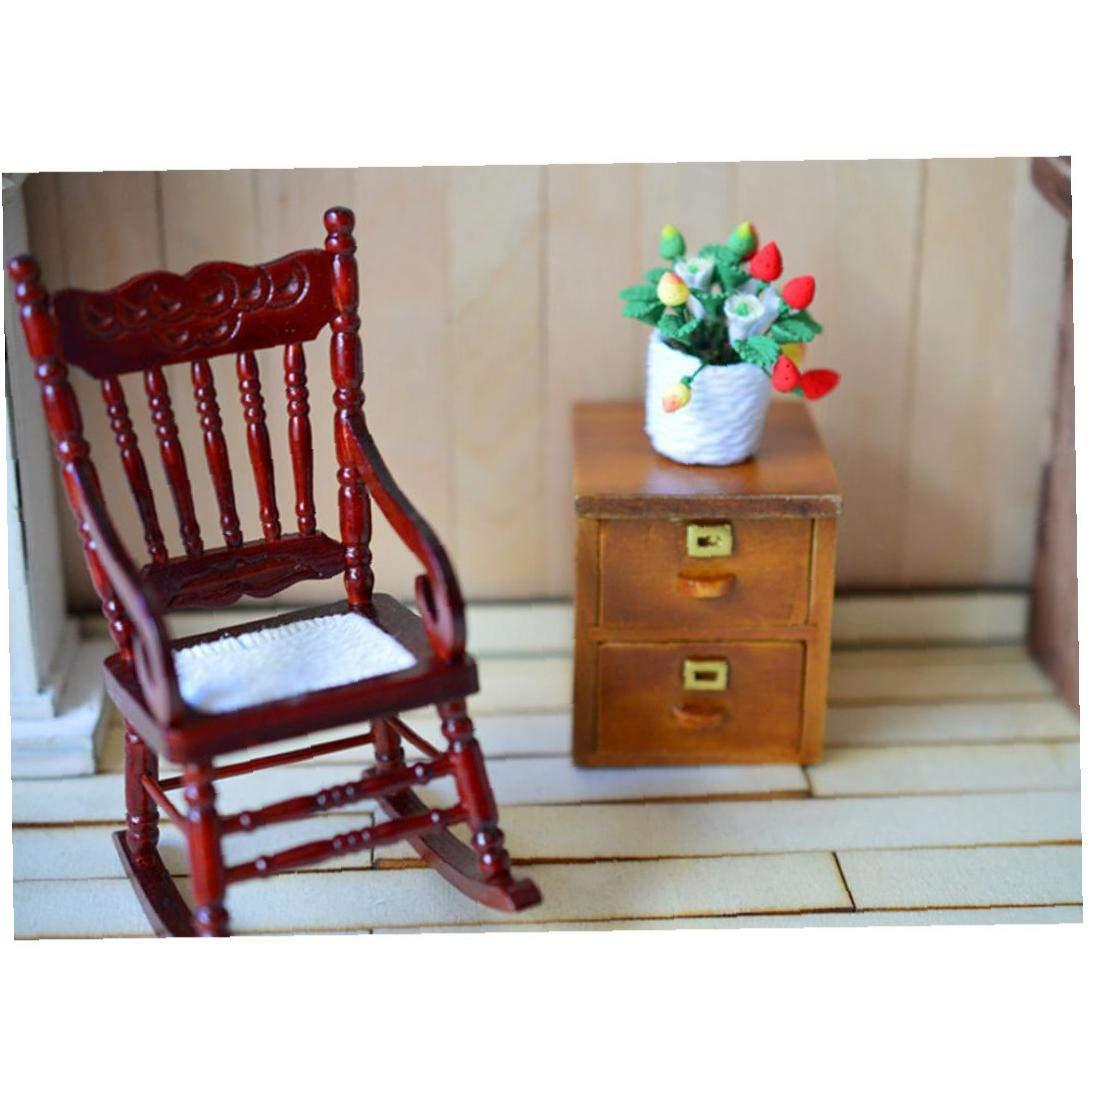 1//12 Casa De Mu/ñecas En Miniatura De Madera Modelo Mecedora Lindo Muebles Juguete-Brown